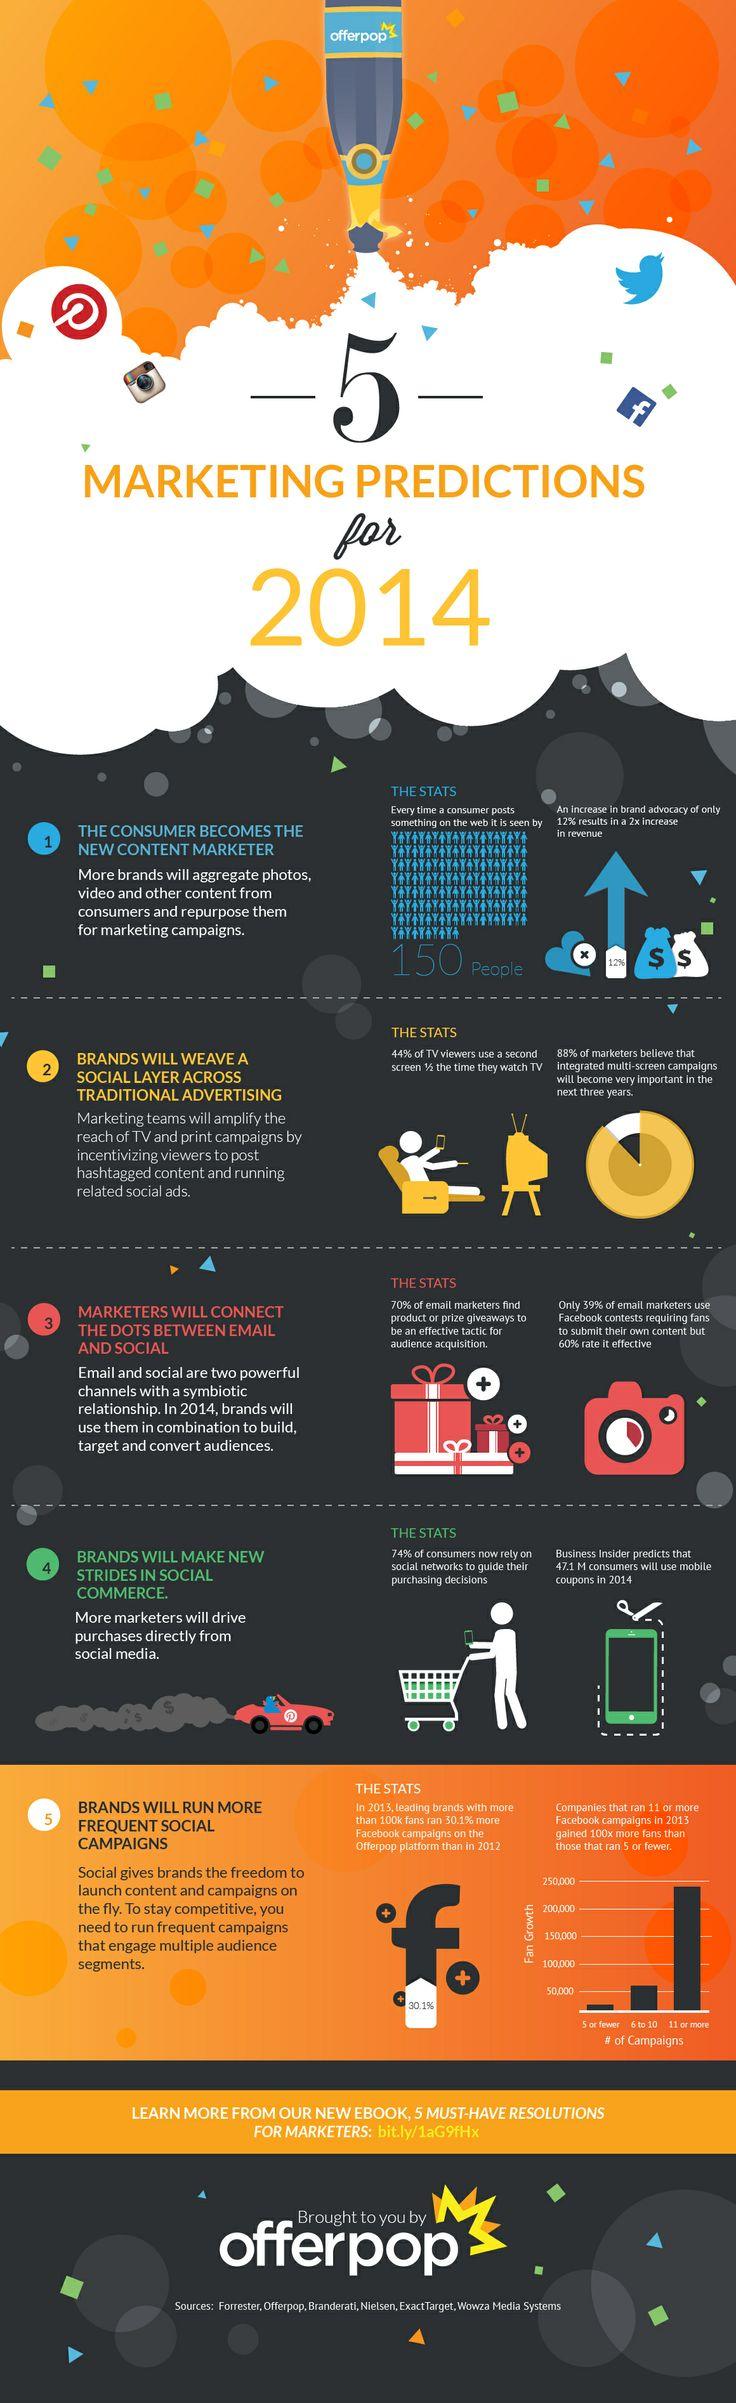 5 marketing predictions for 2014. www.linkreaction.com.au